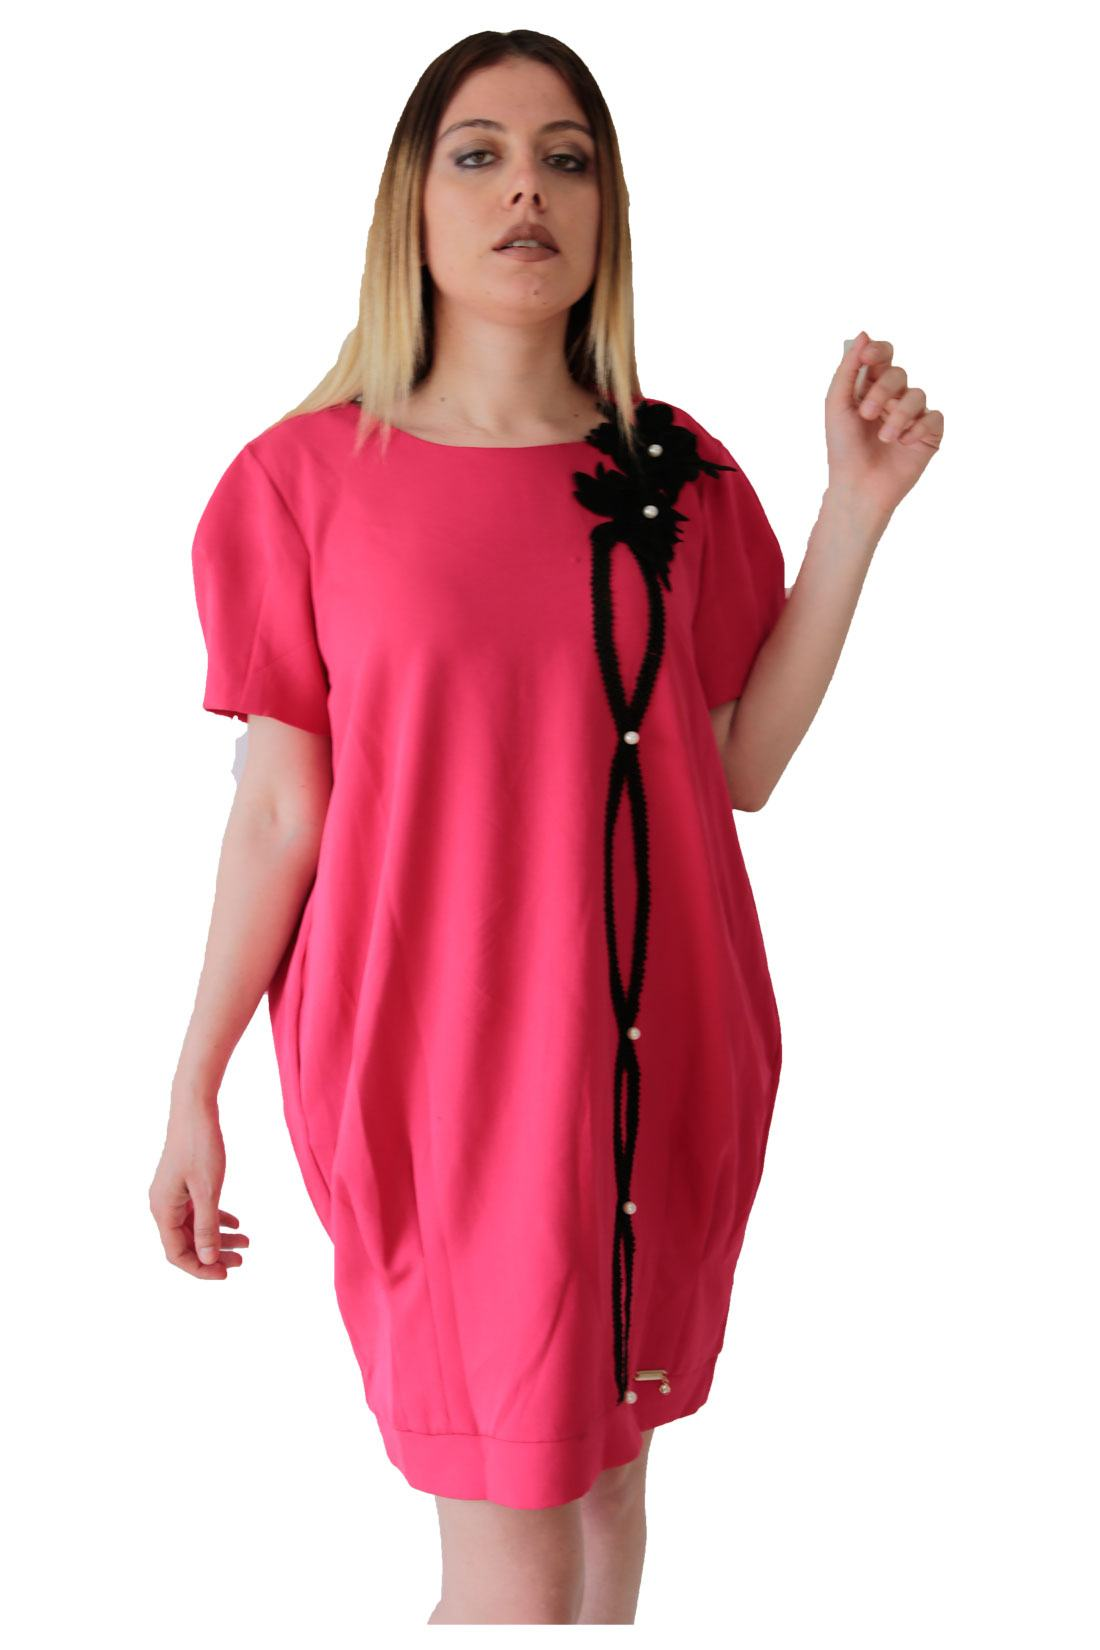 983bca99538d8 Moda Royal Bayan Elbise Vişne Detaylı Bayan Elbise - Glami.com.tr